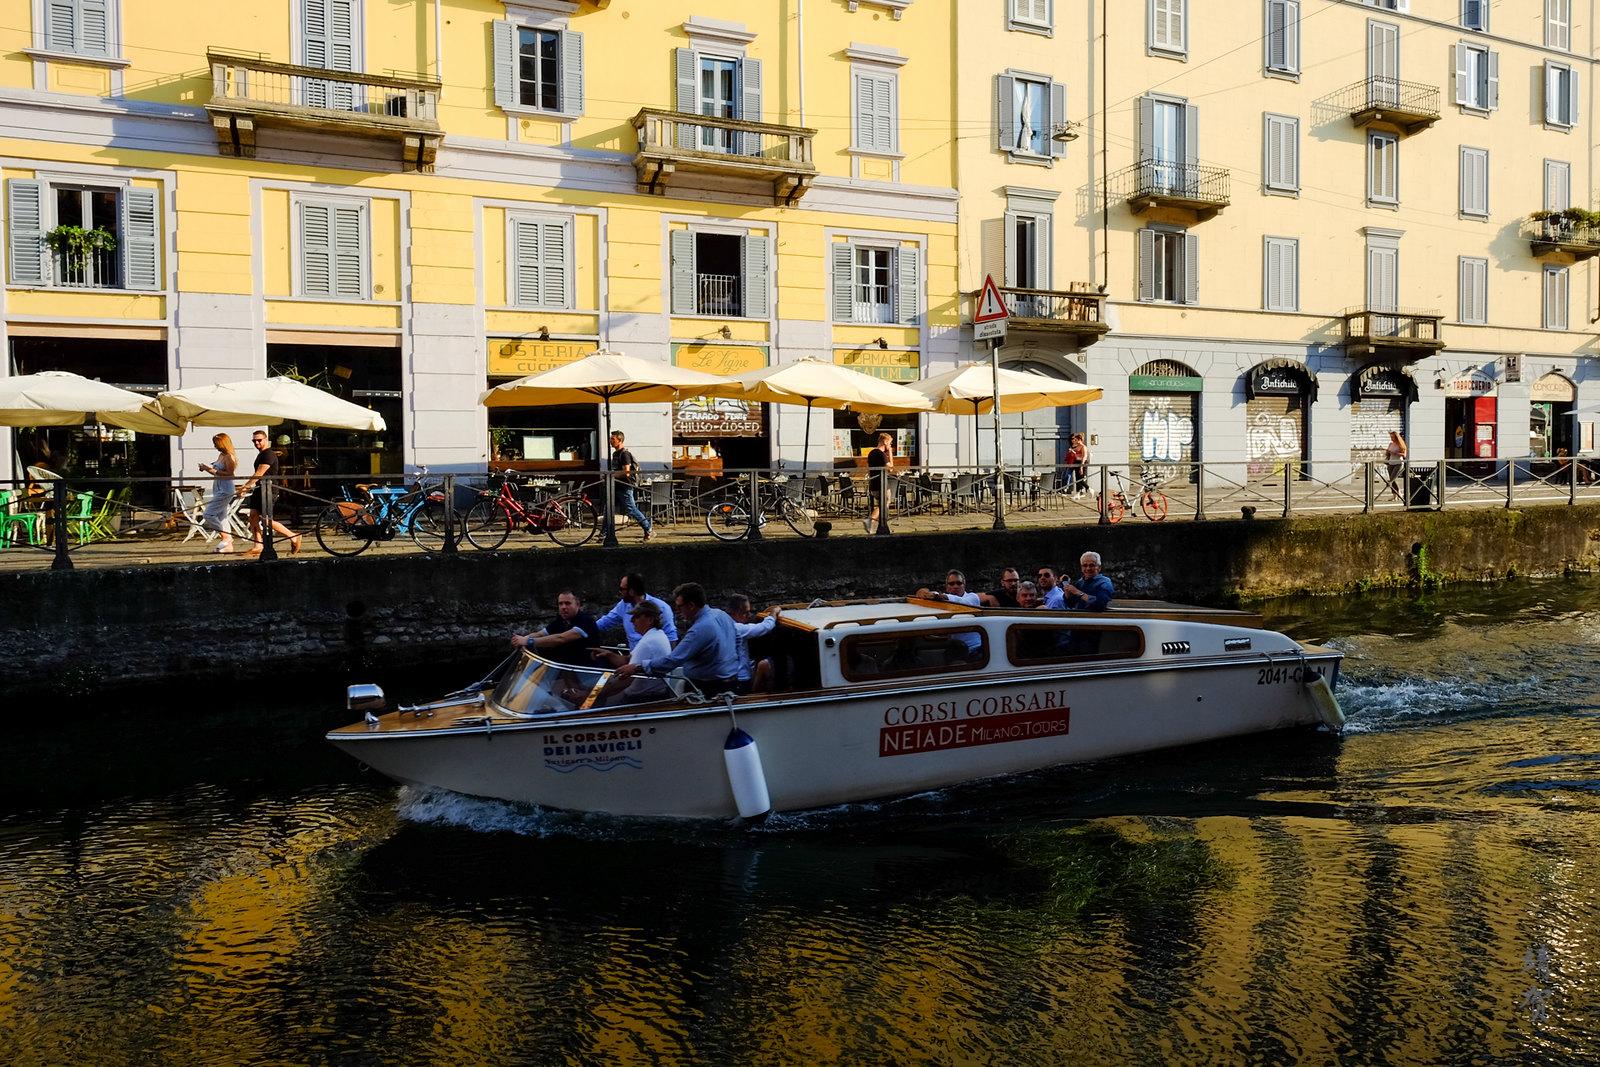 Boats cruising in Navigli